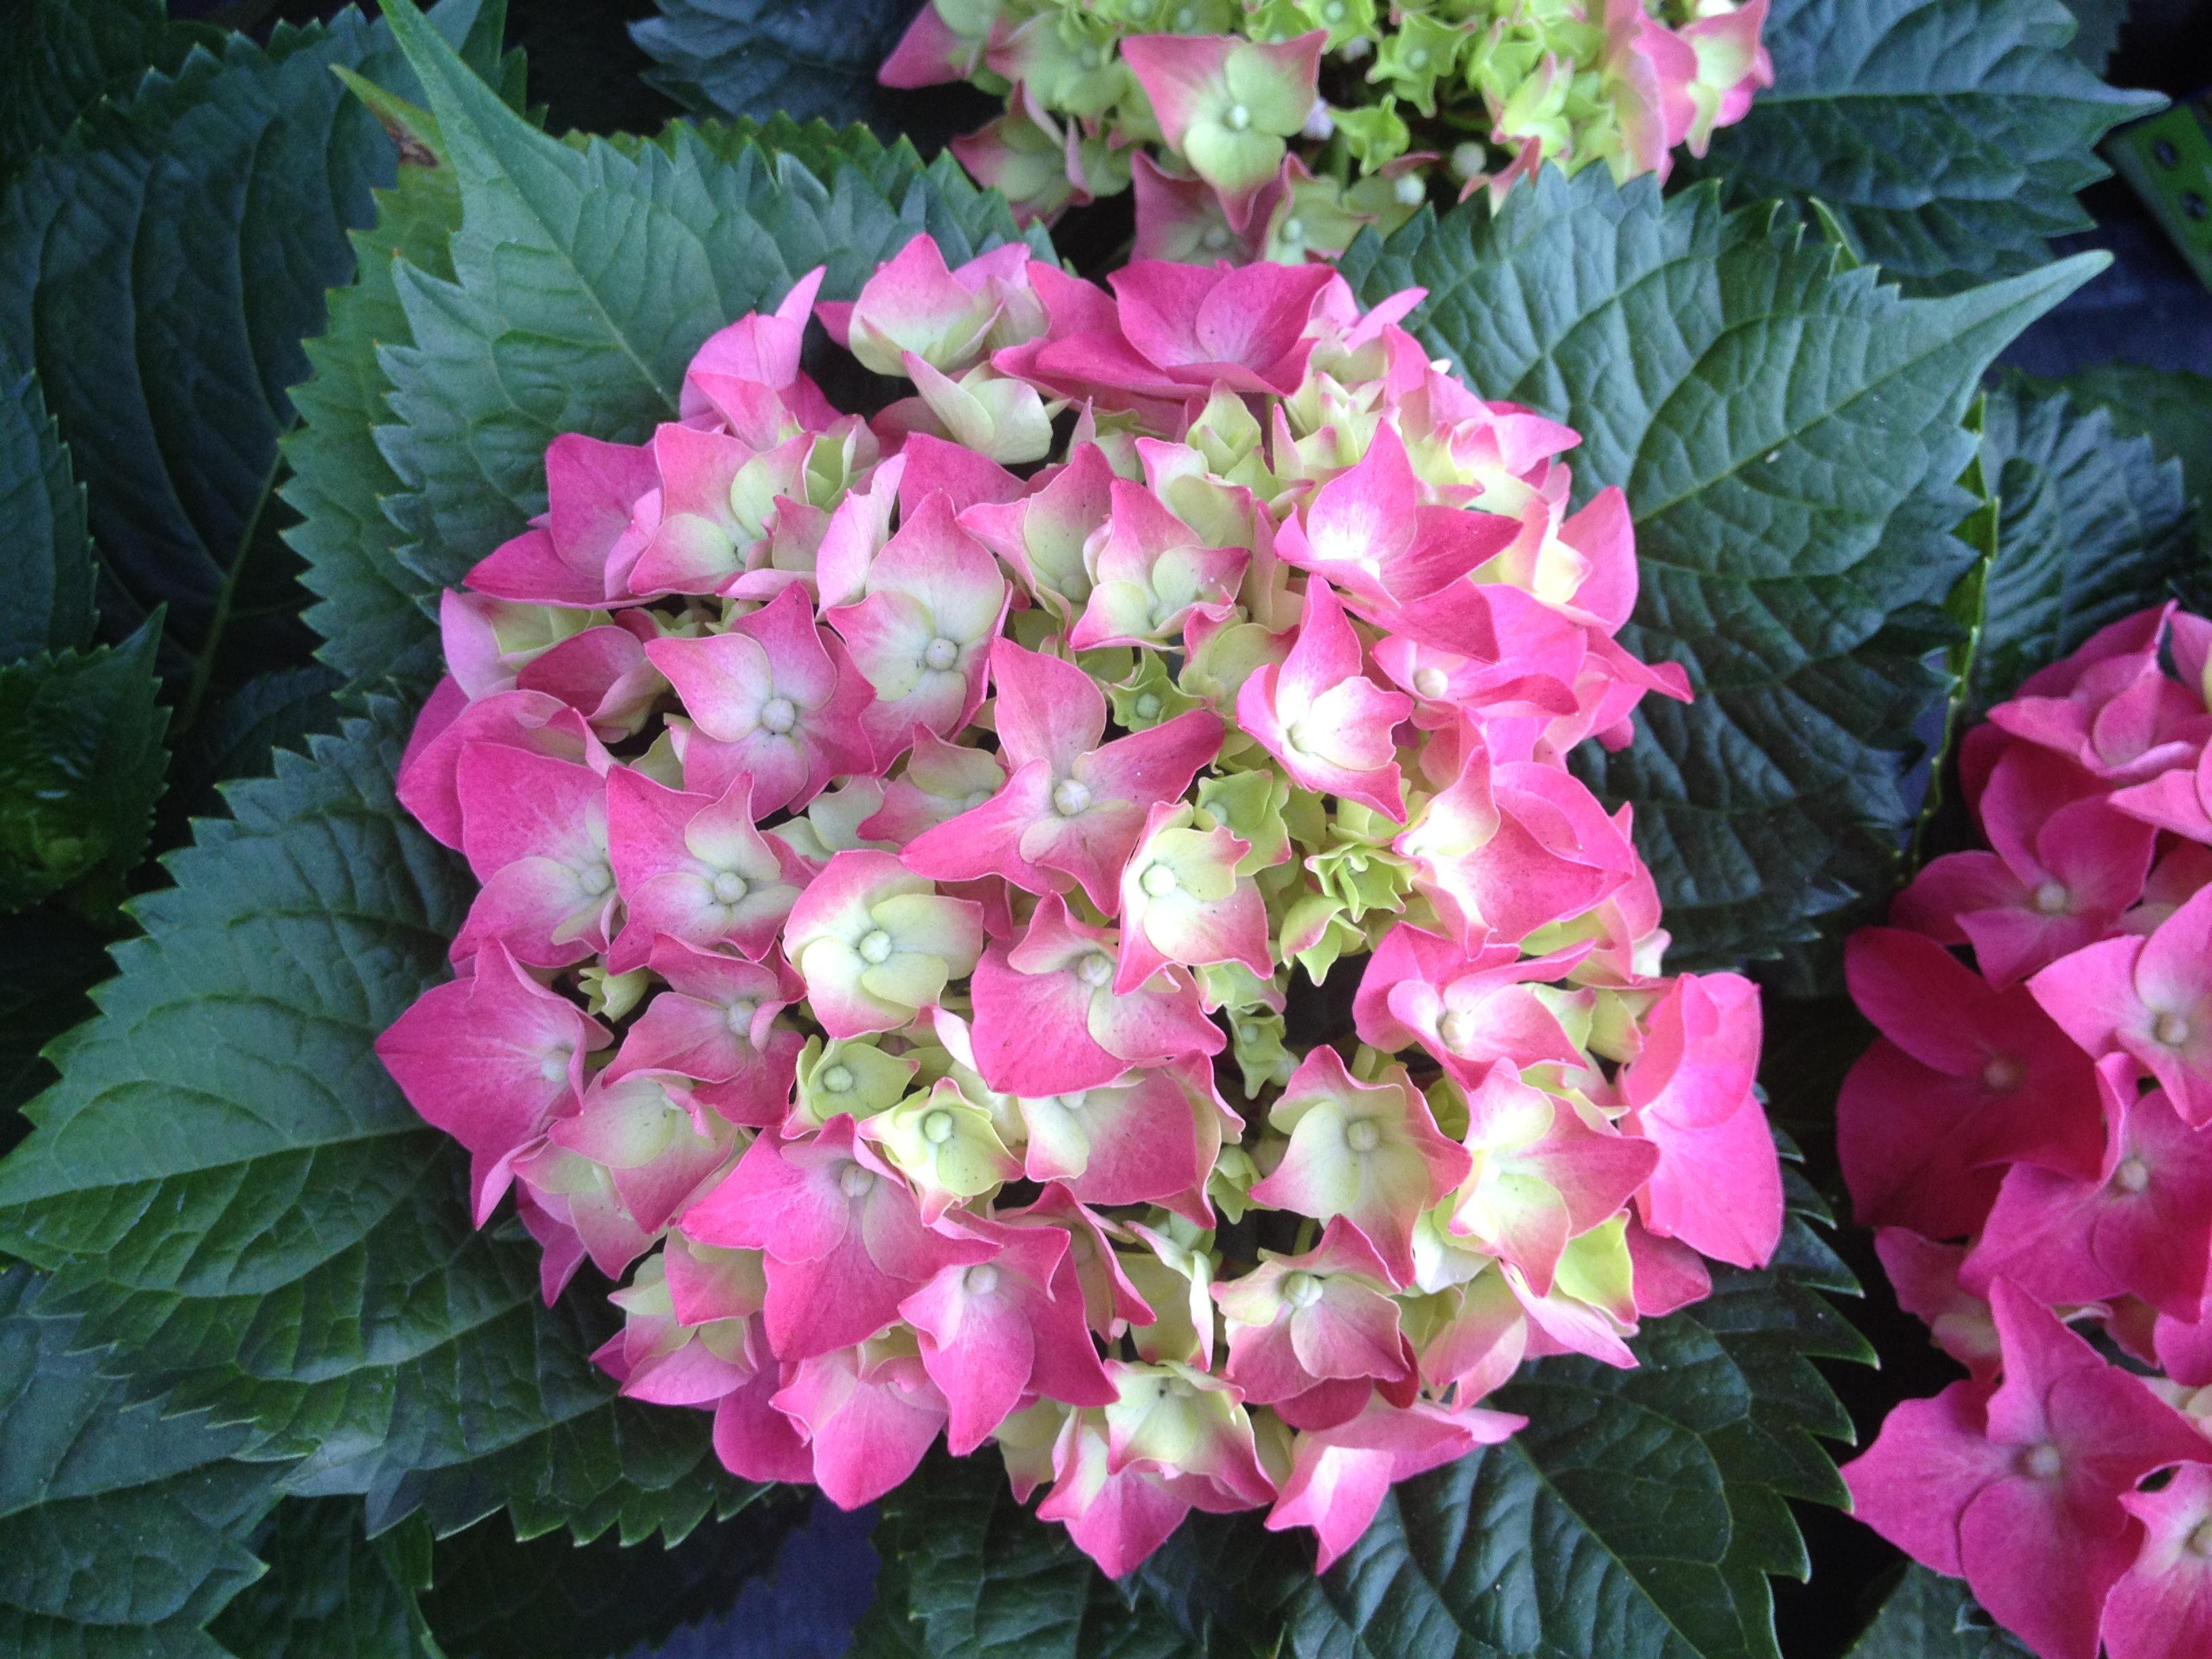 Hydrangea hydrangea macrophylla beautiful flowers for garden izmirmasajfo